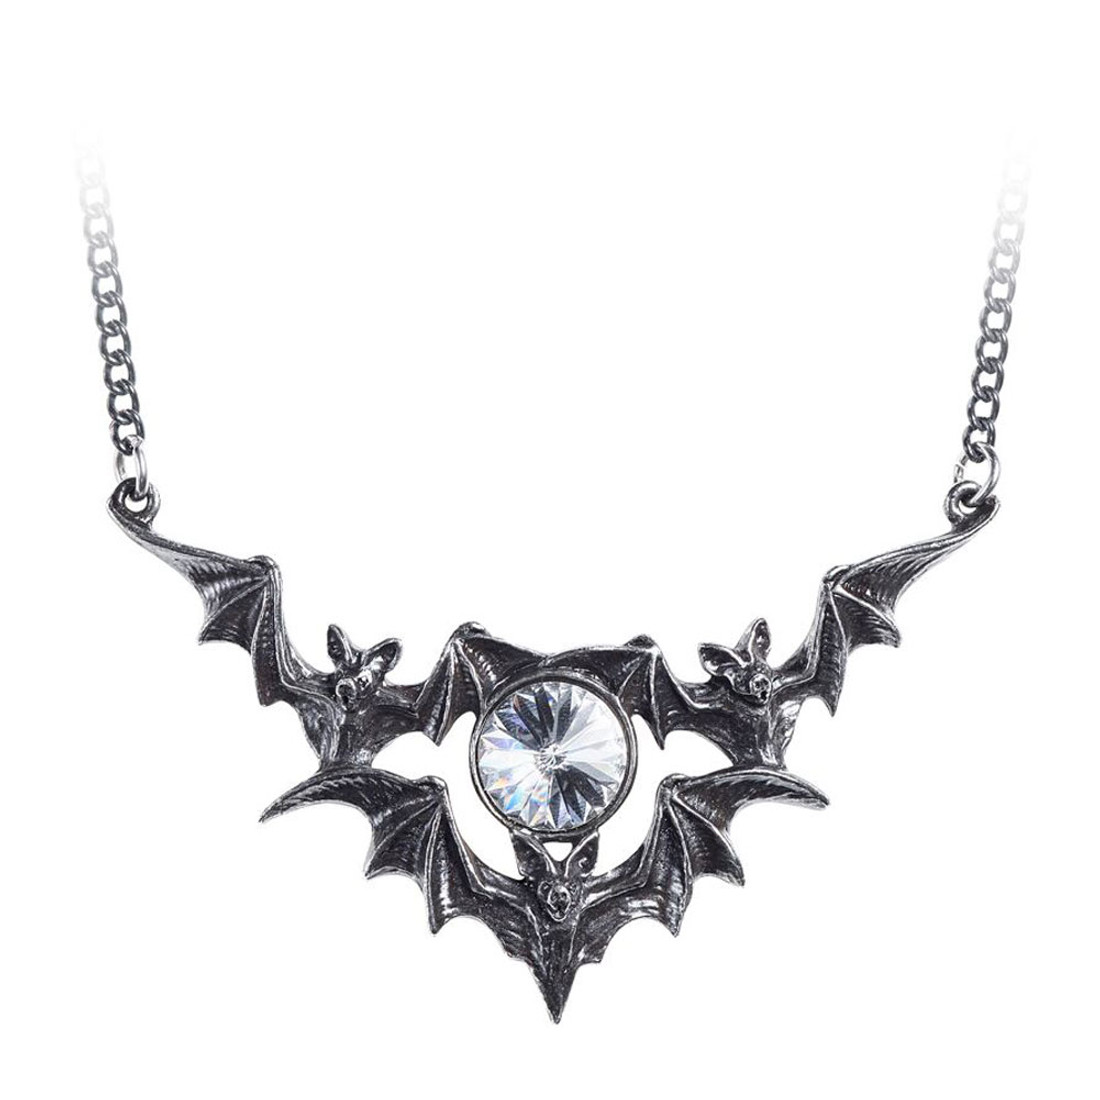 Alchemy Gothic Phantom Bat Pendant Necklace Pewter Jewelry P852